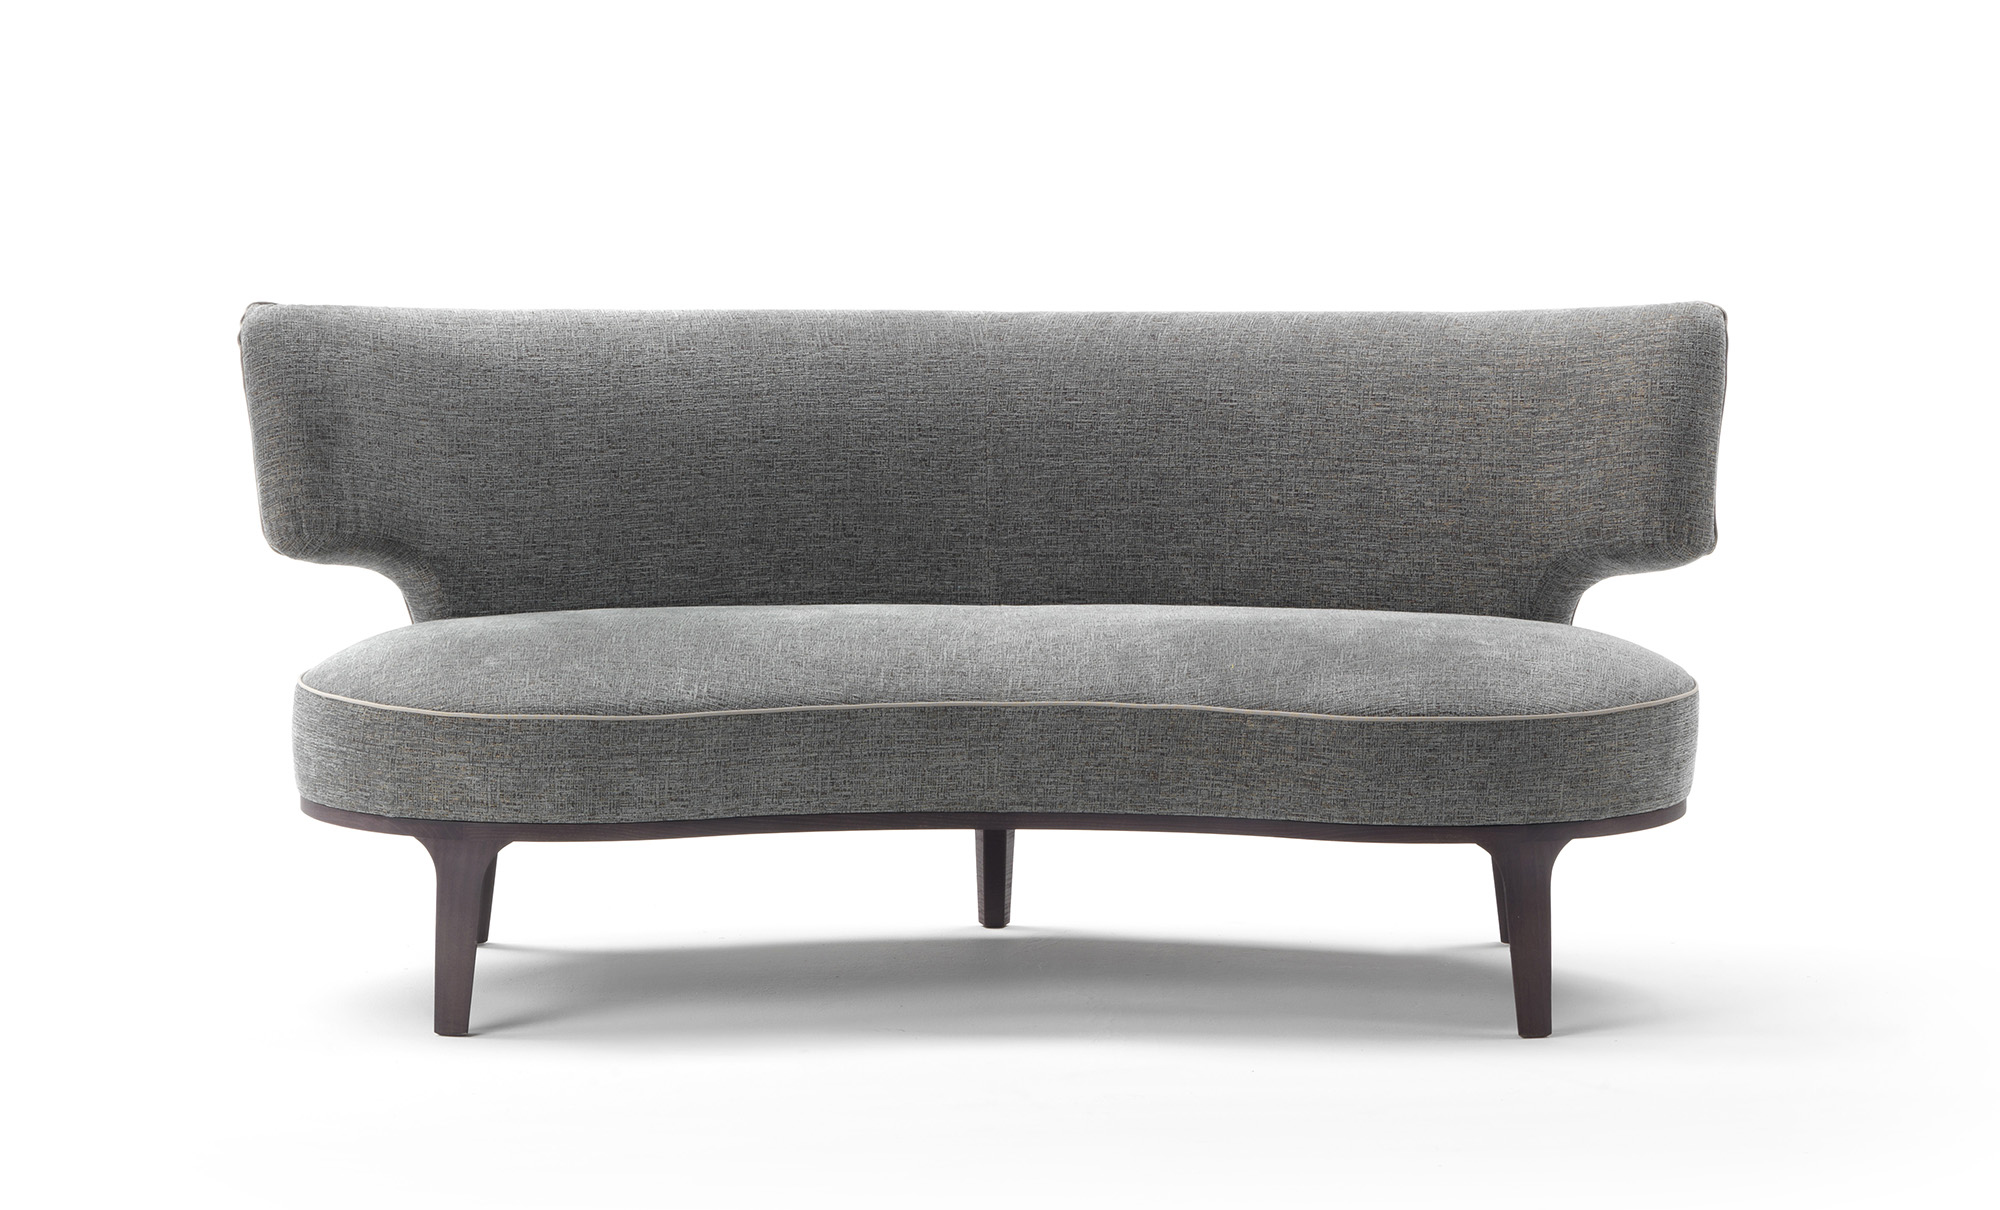 wohndesign kleines wohnzimmer groses sofa images. Black Bedroom Furniture Sets. Home Design Ideas